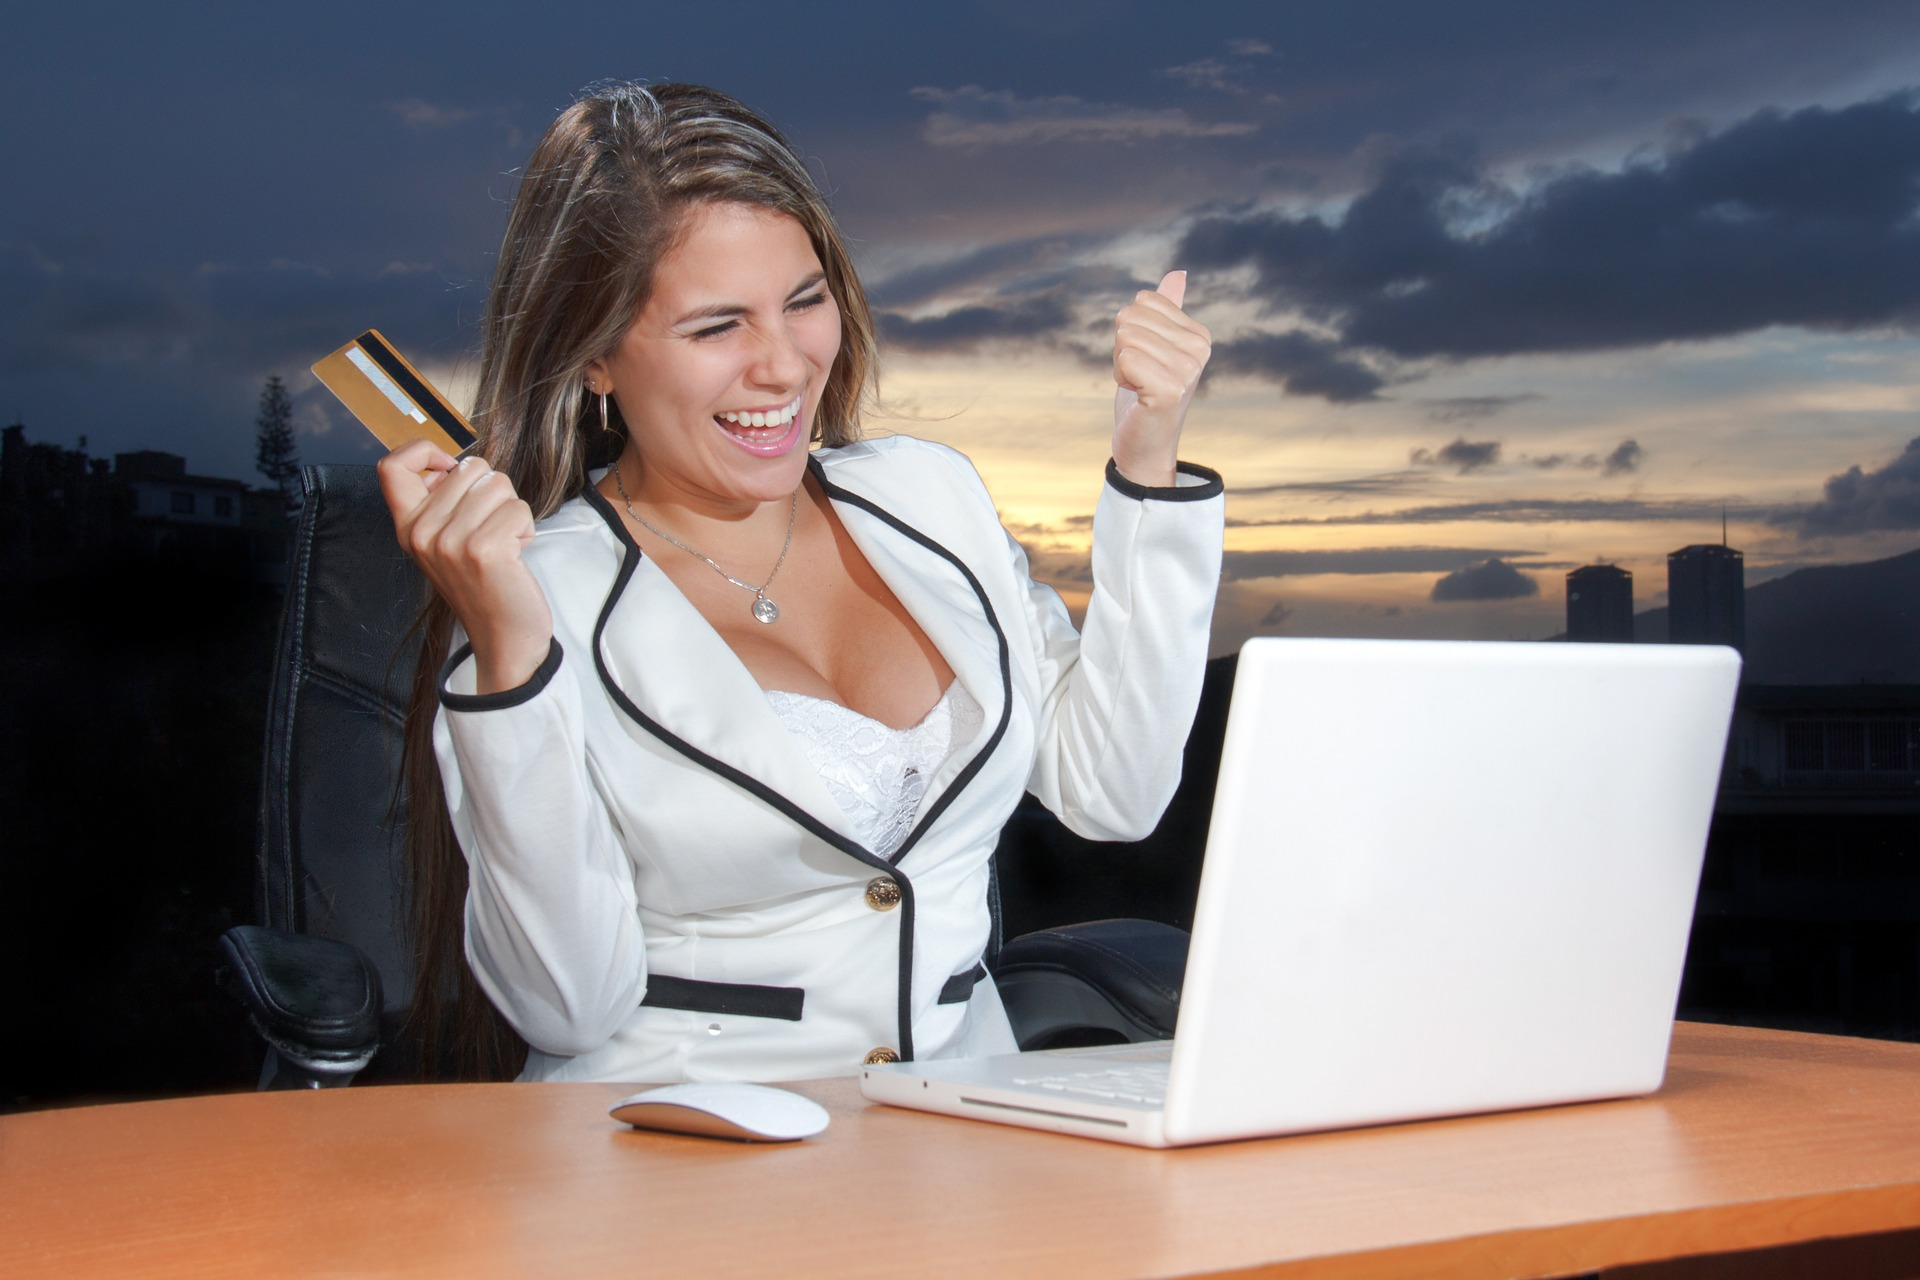 Кредит онлайн – это просто